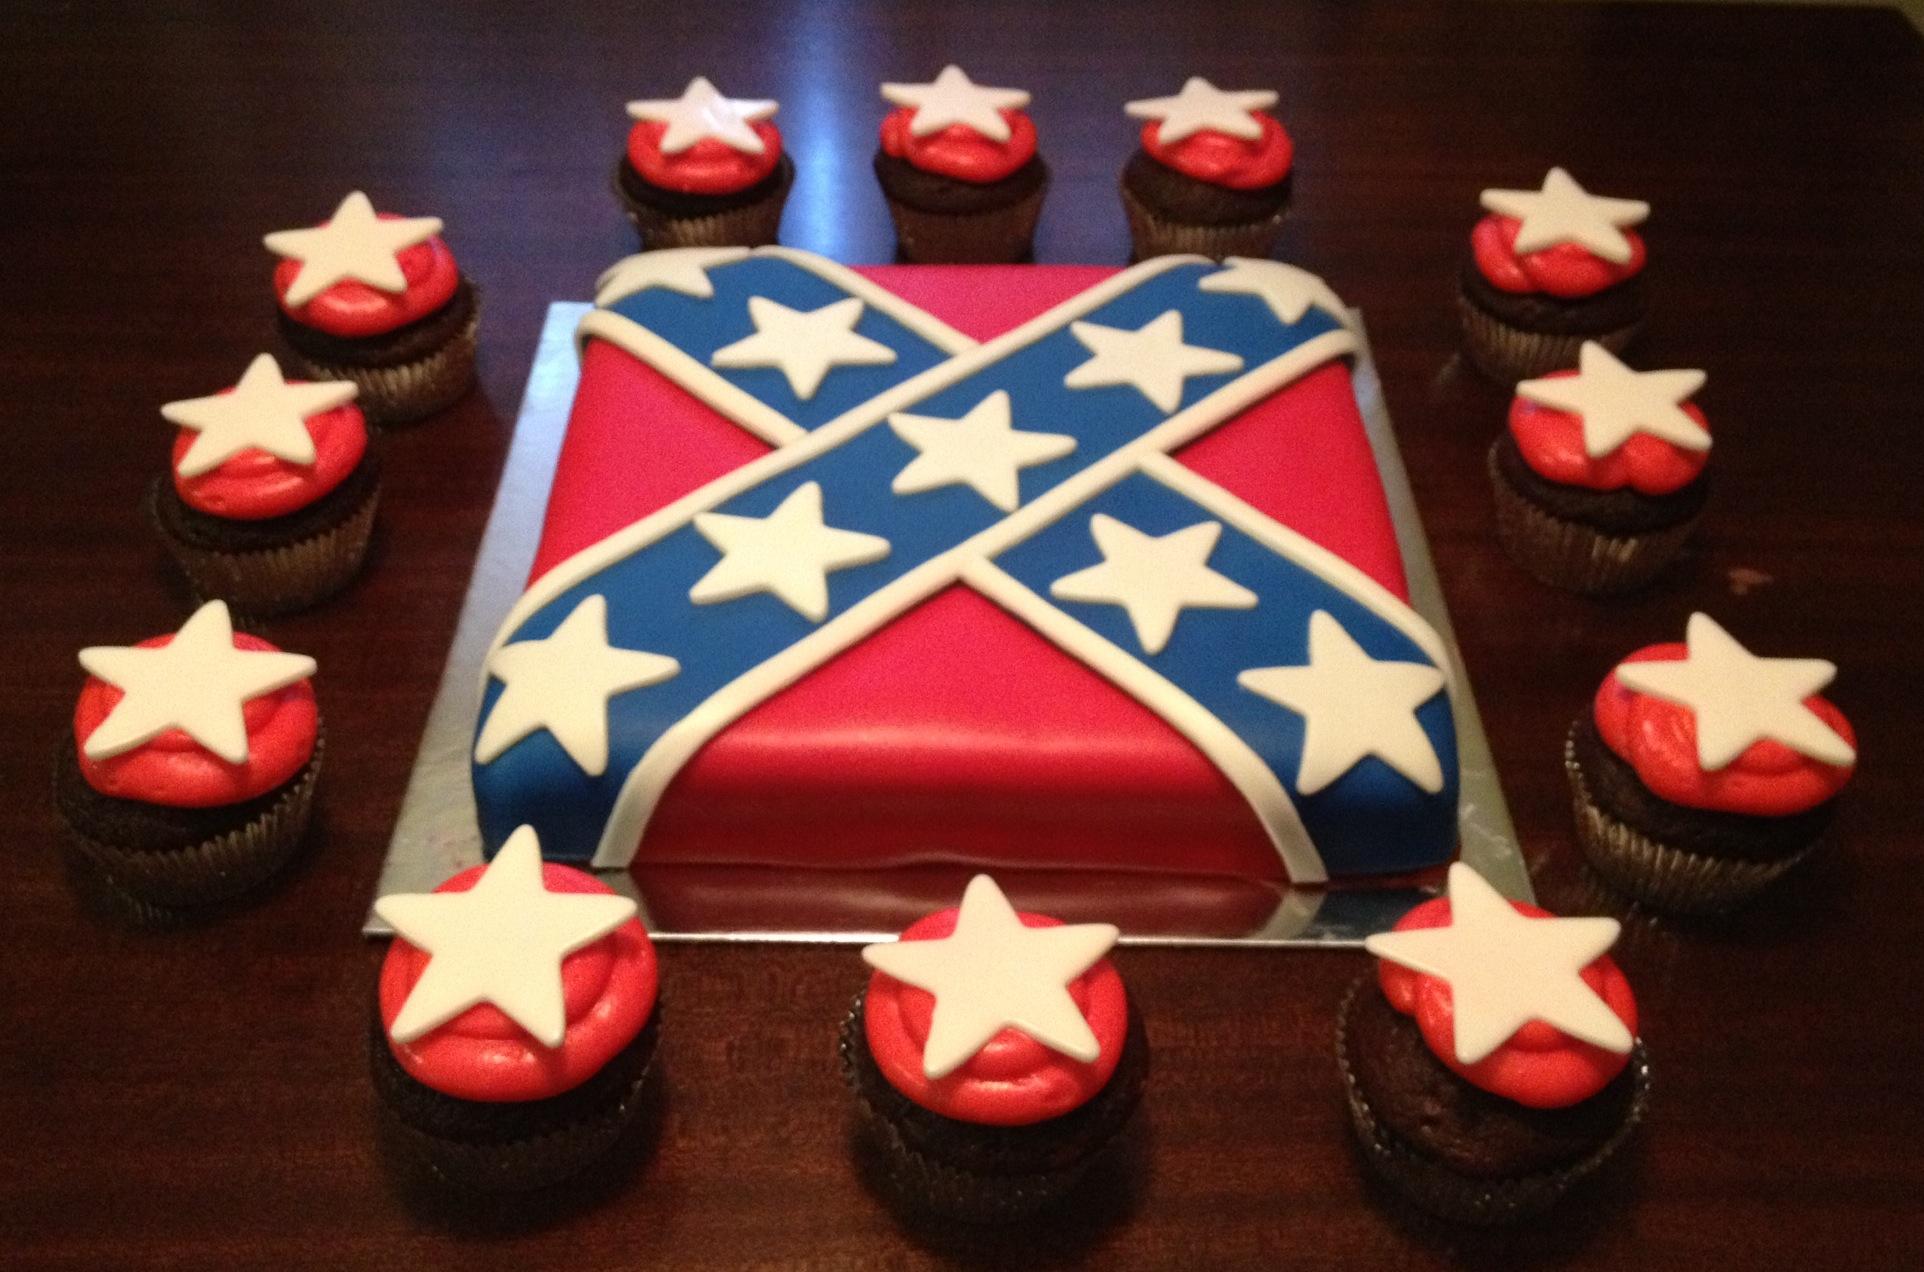 11 Rebel Flag Groom Cakes Photo - Confederate Flag Cake, Rebel Flag ...